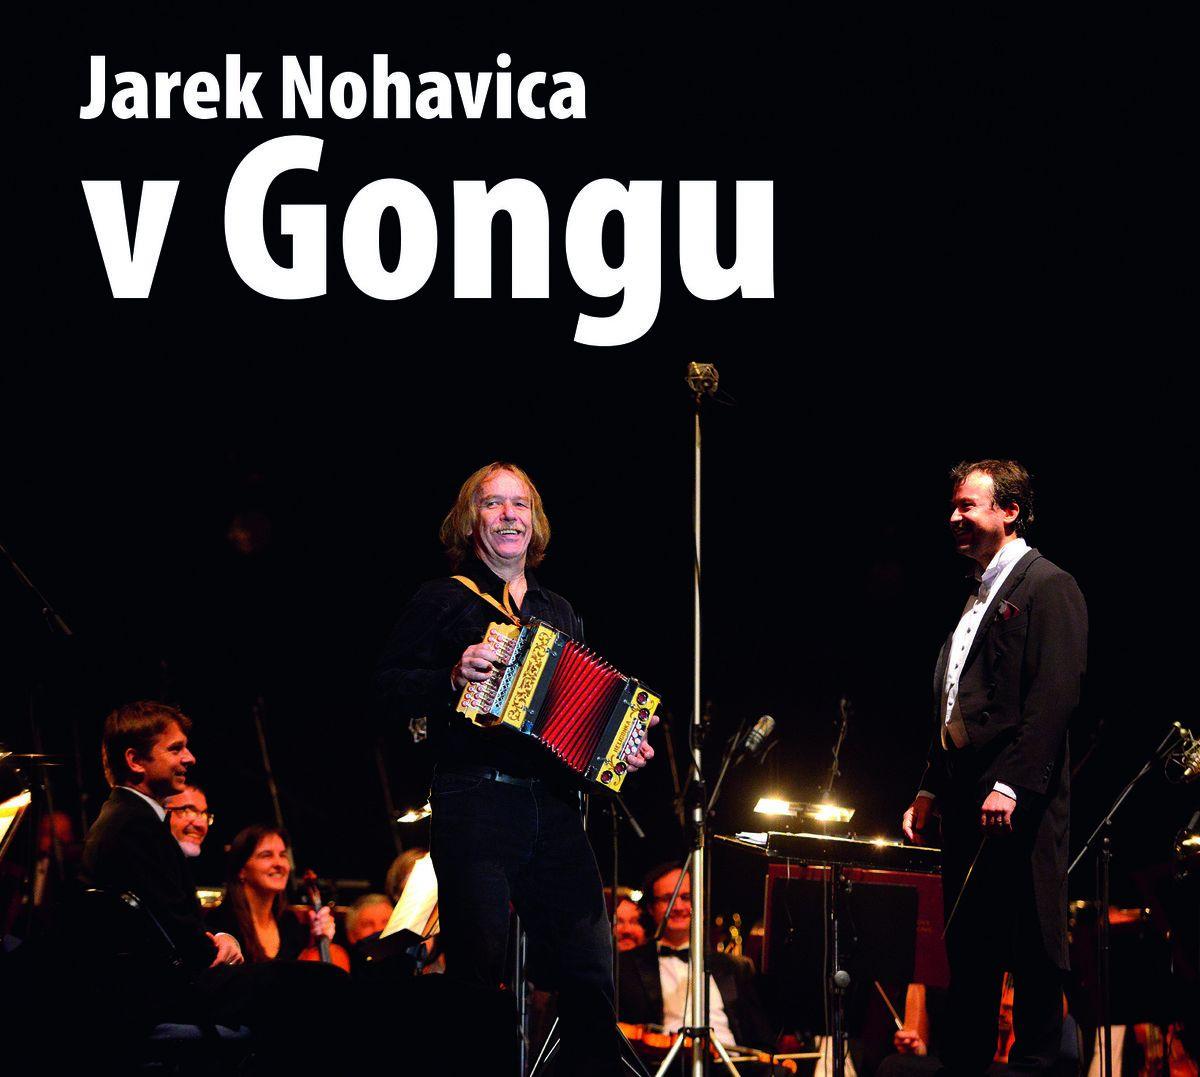 V gongu - CD + DVD